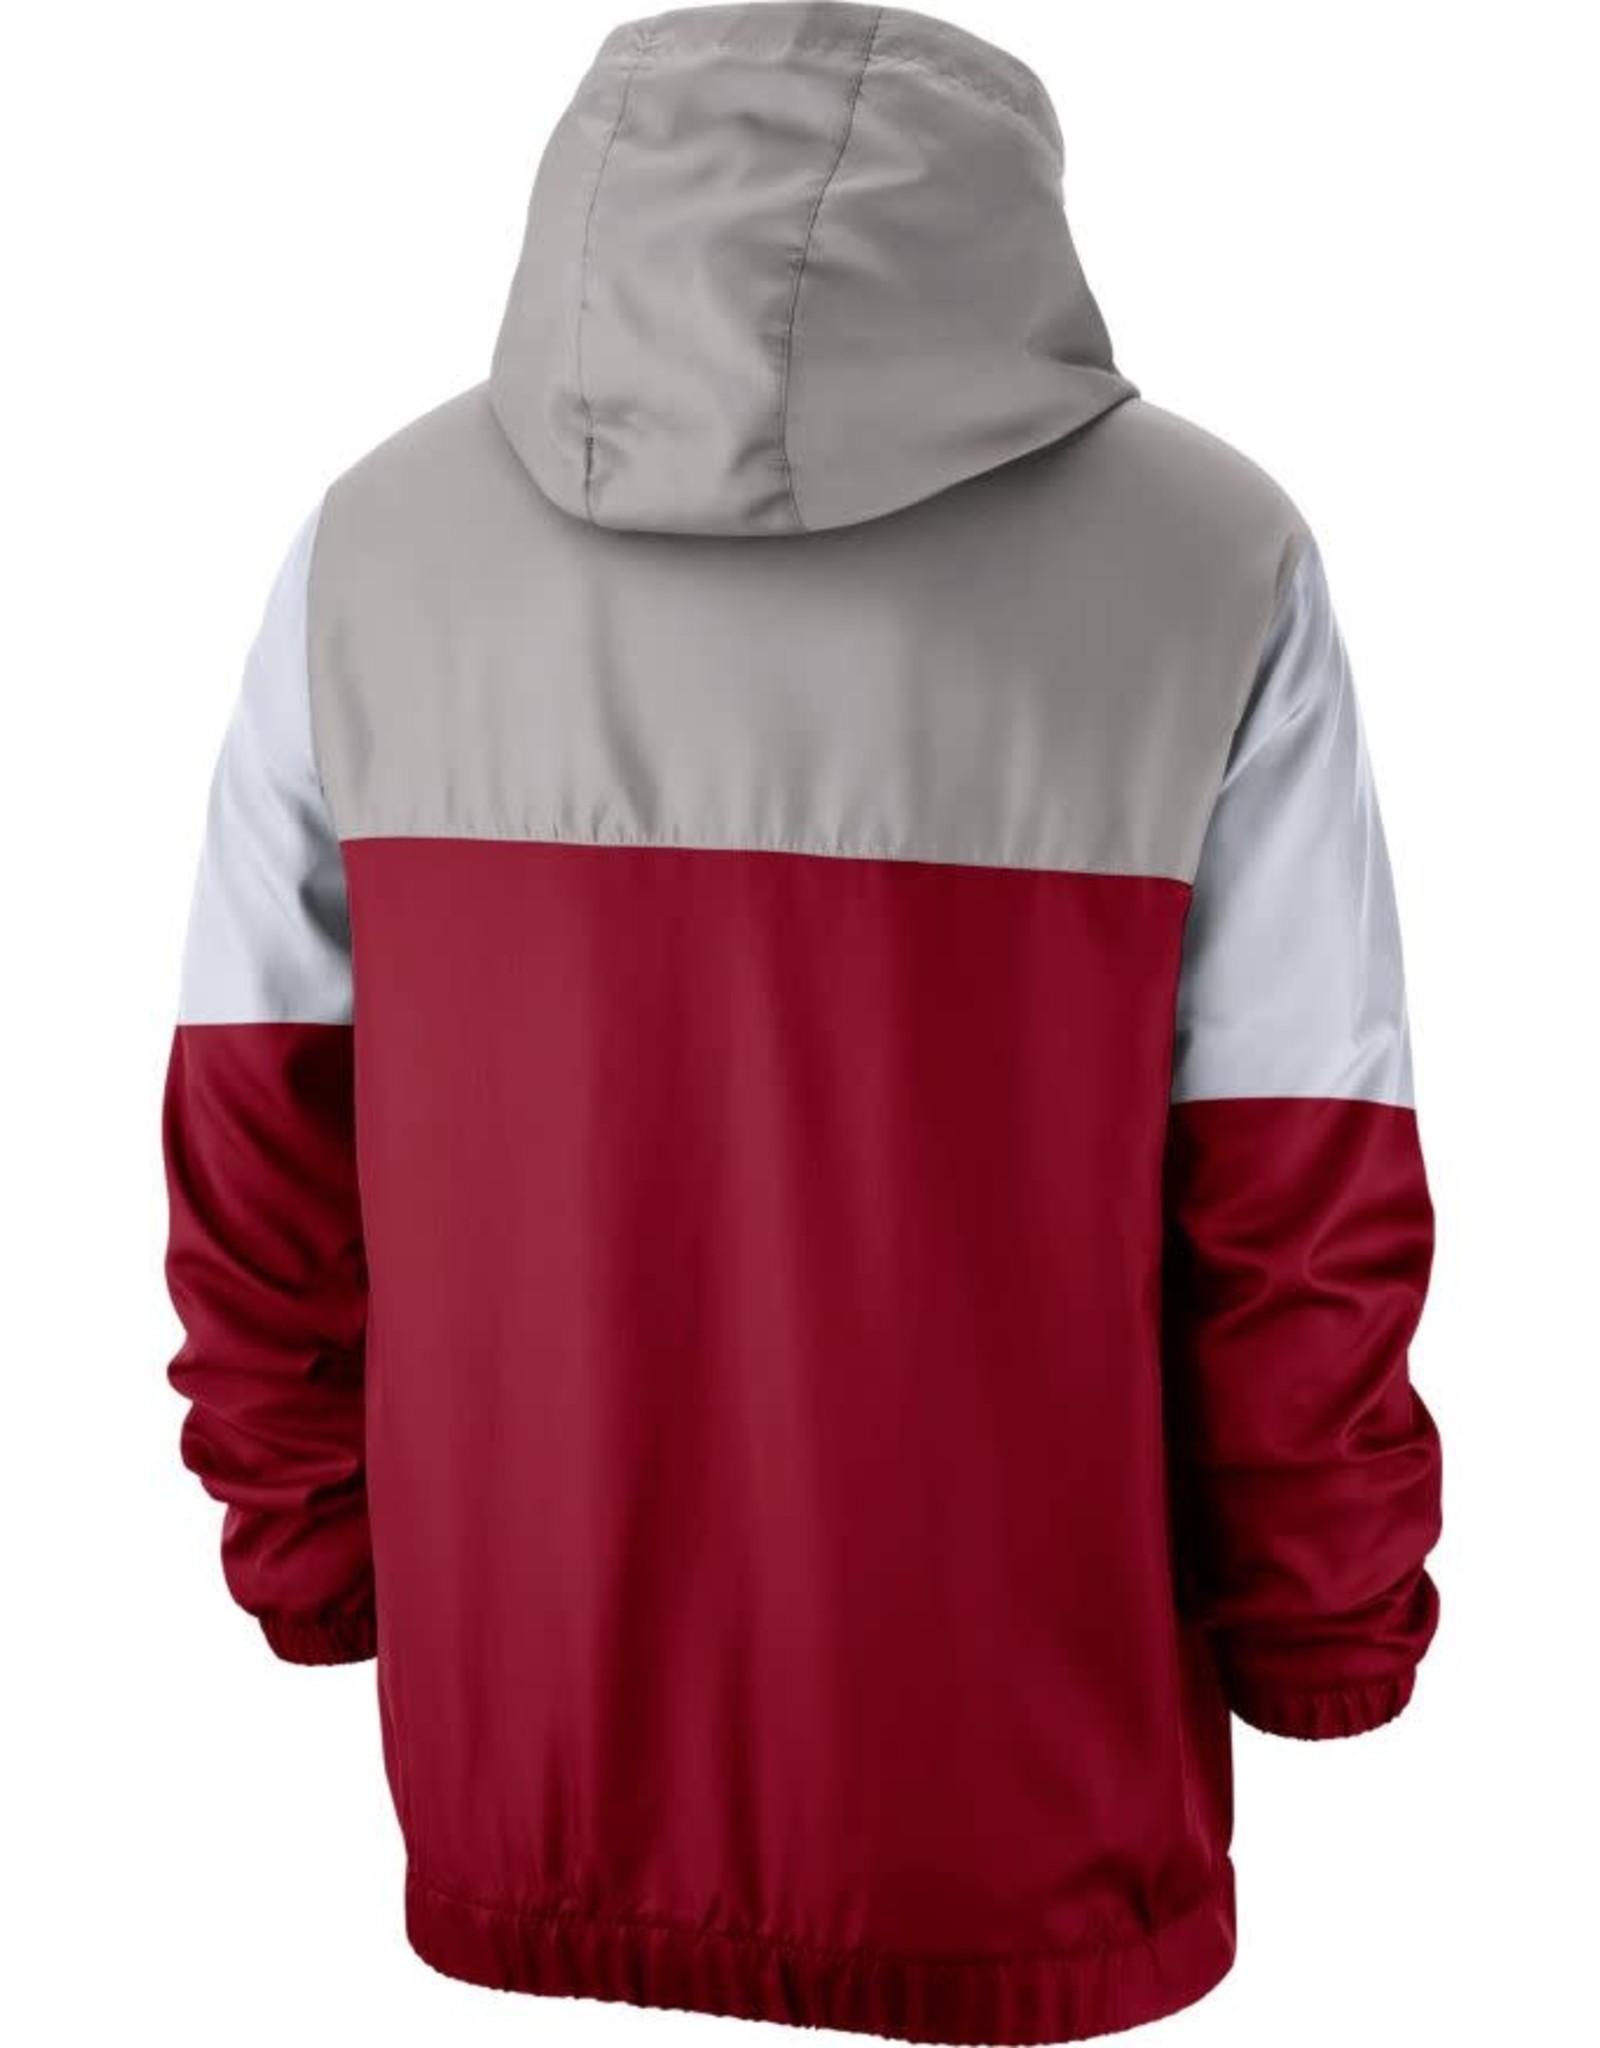 Jordan Men's Jordan OU Helmet Anorak Jacket